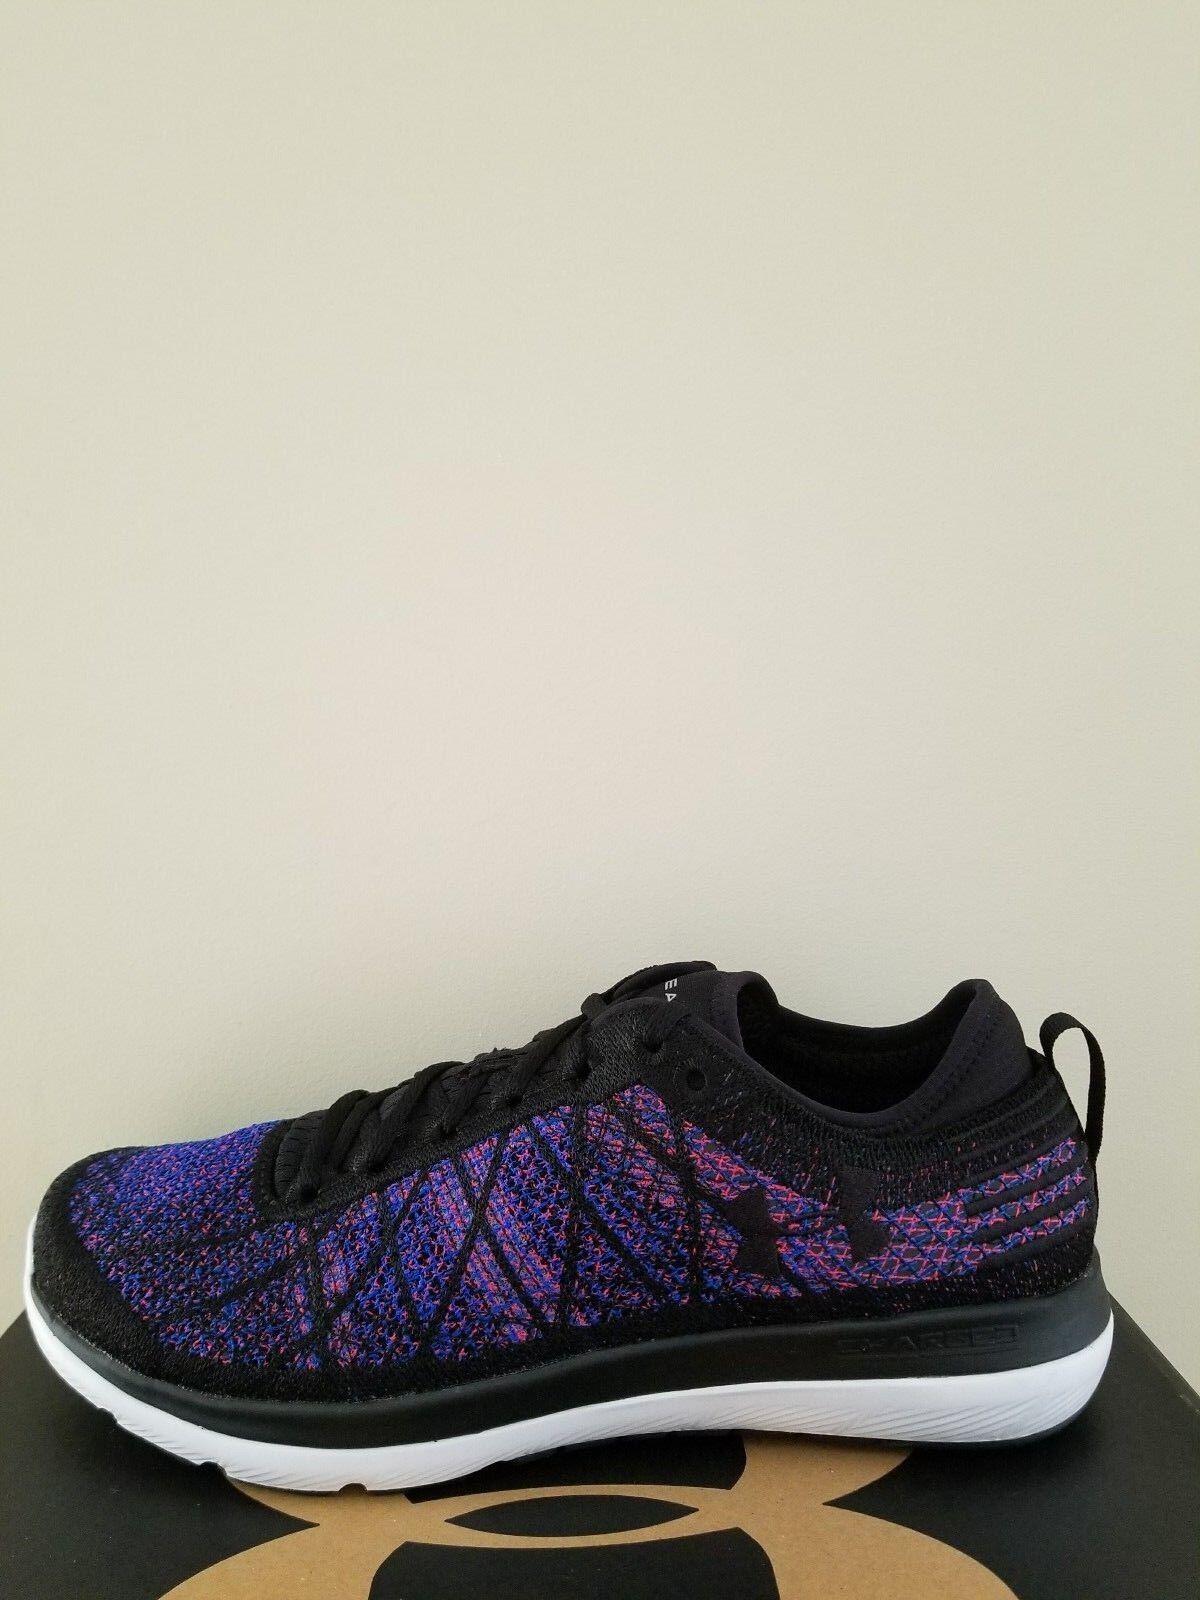 New Under Armour Men's UA  Threadborne Fortis Sneakers Size 11 NIB